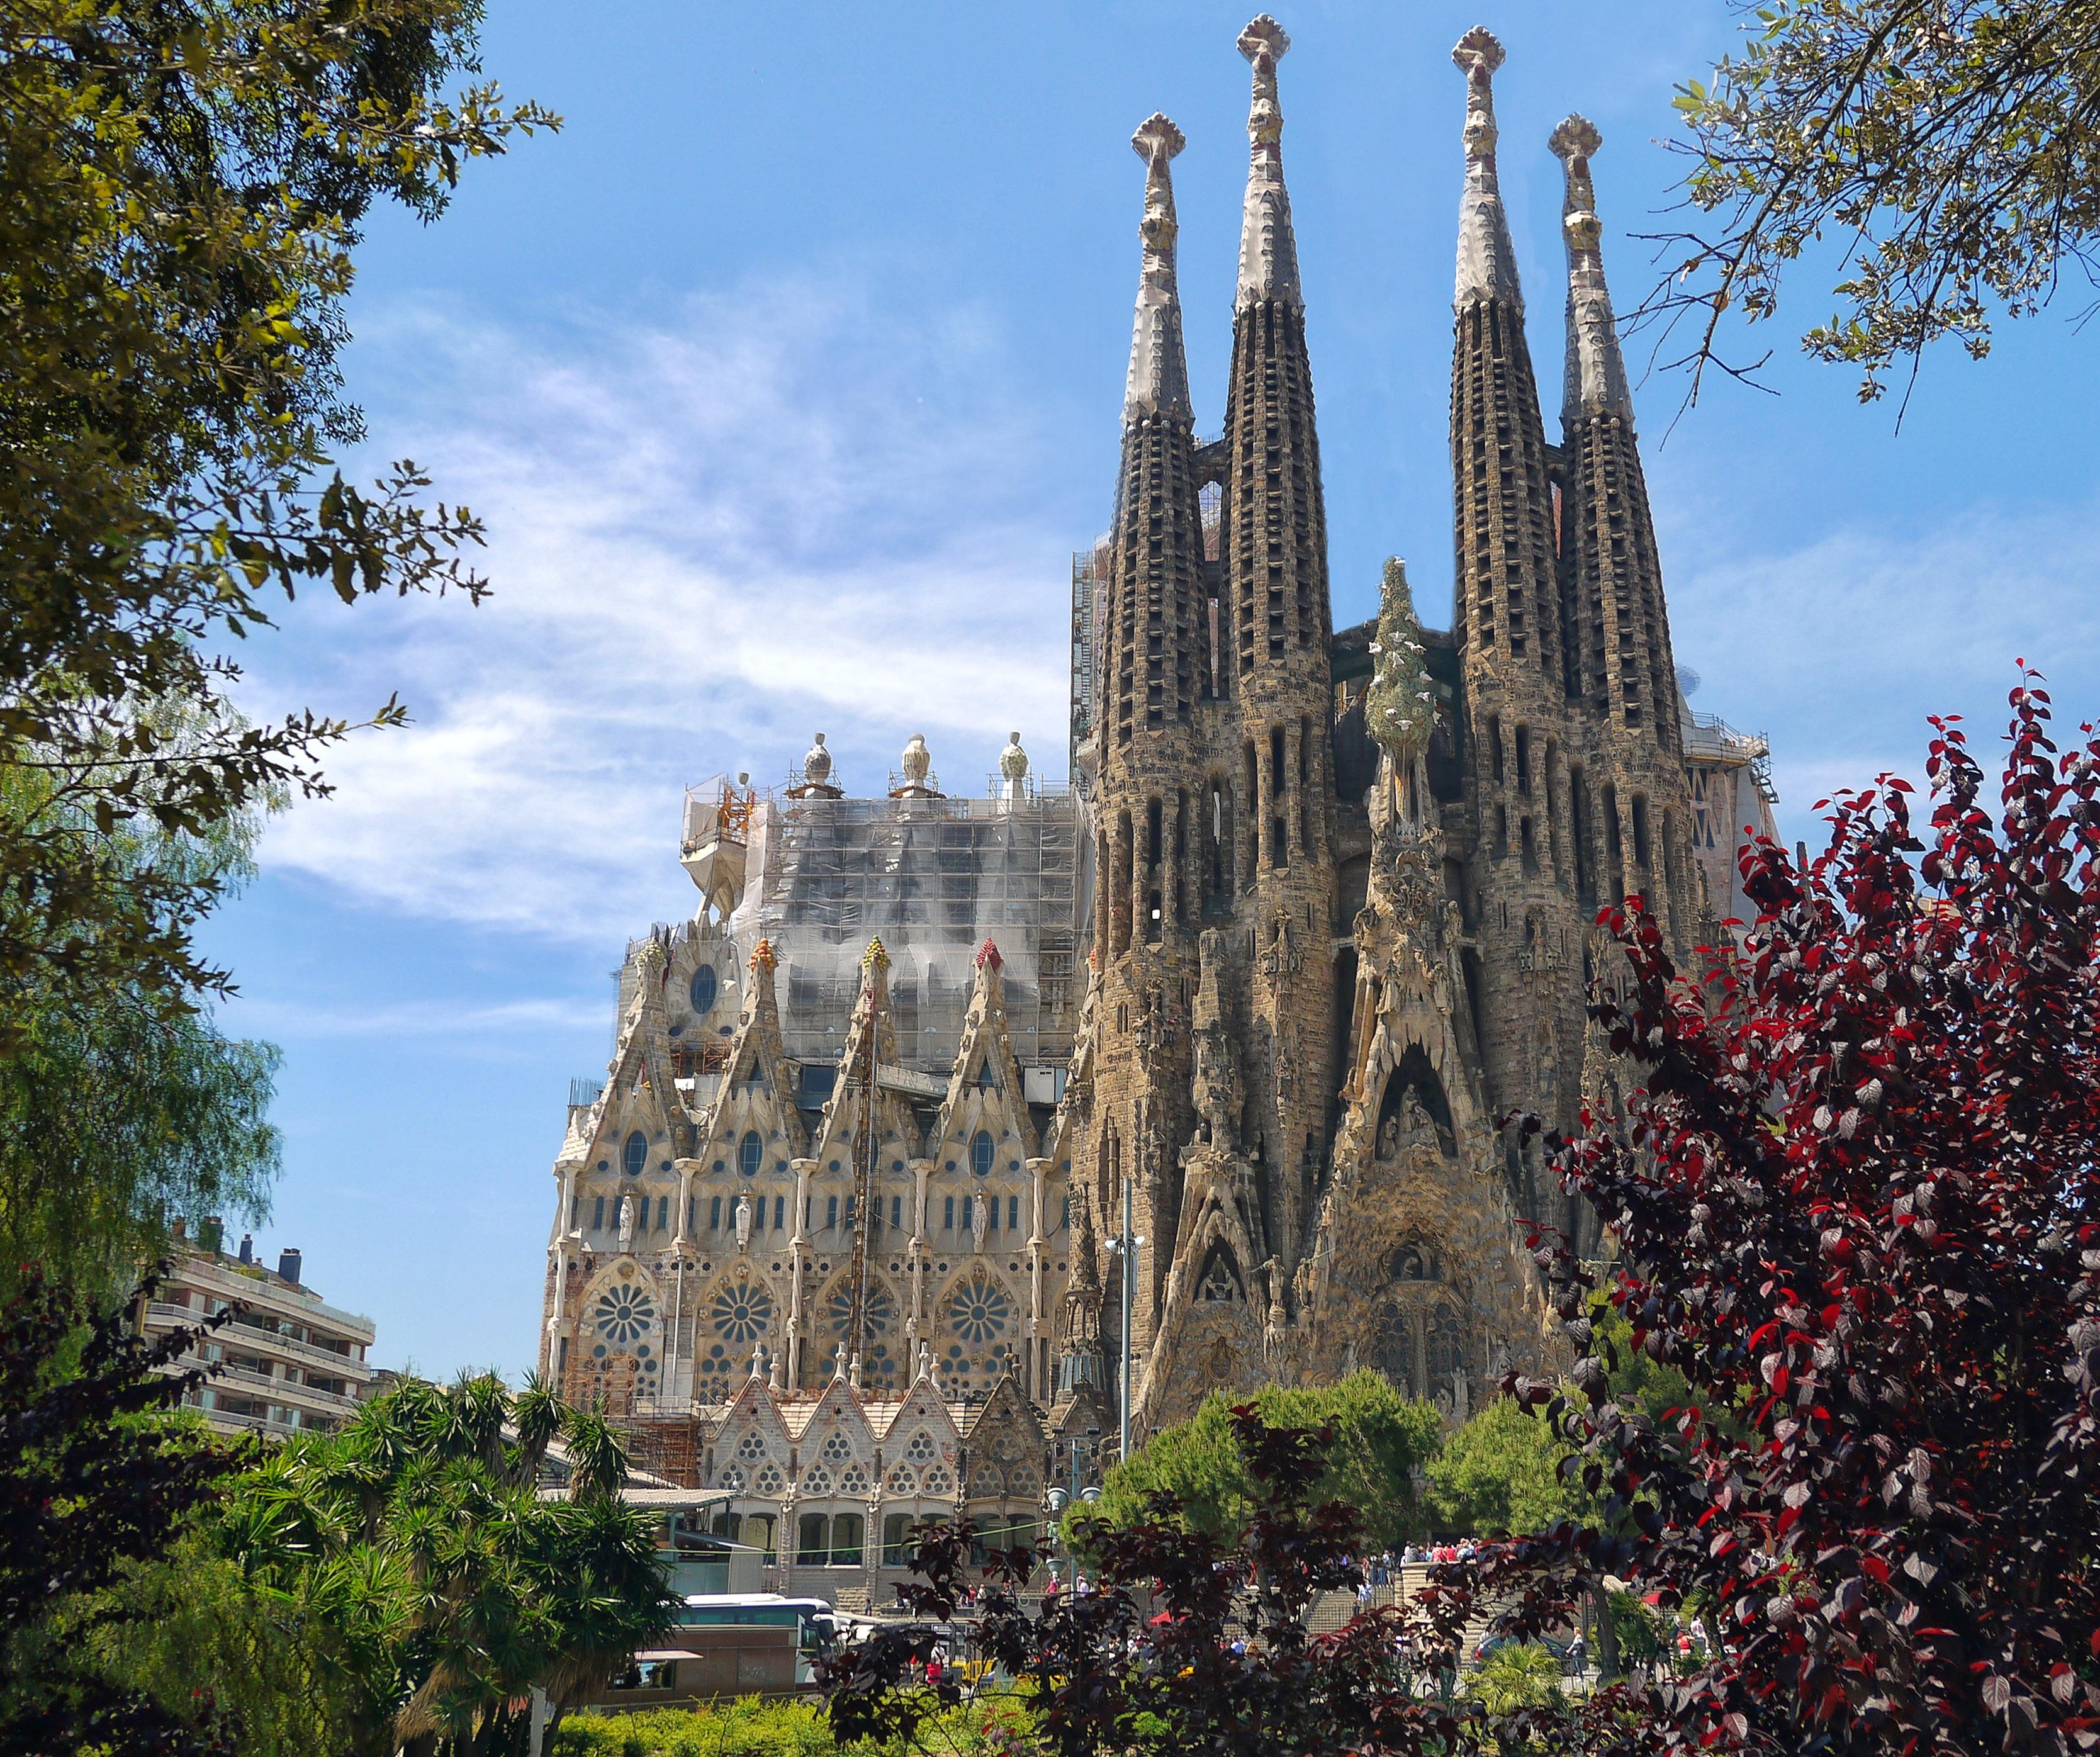 Day 9: Barcelona, Spain Itinerary